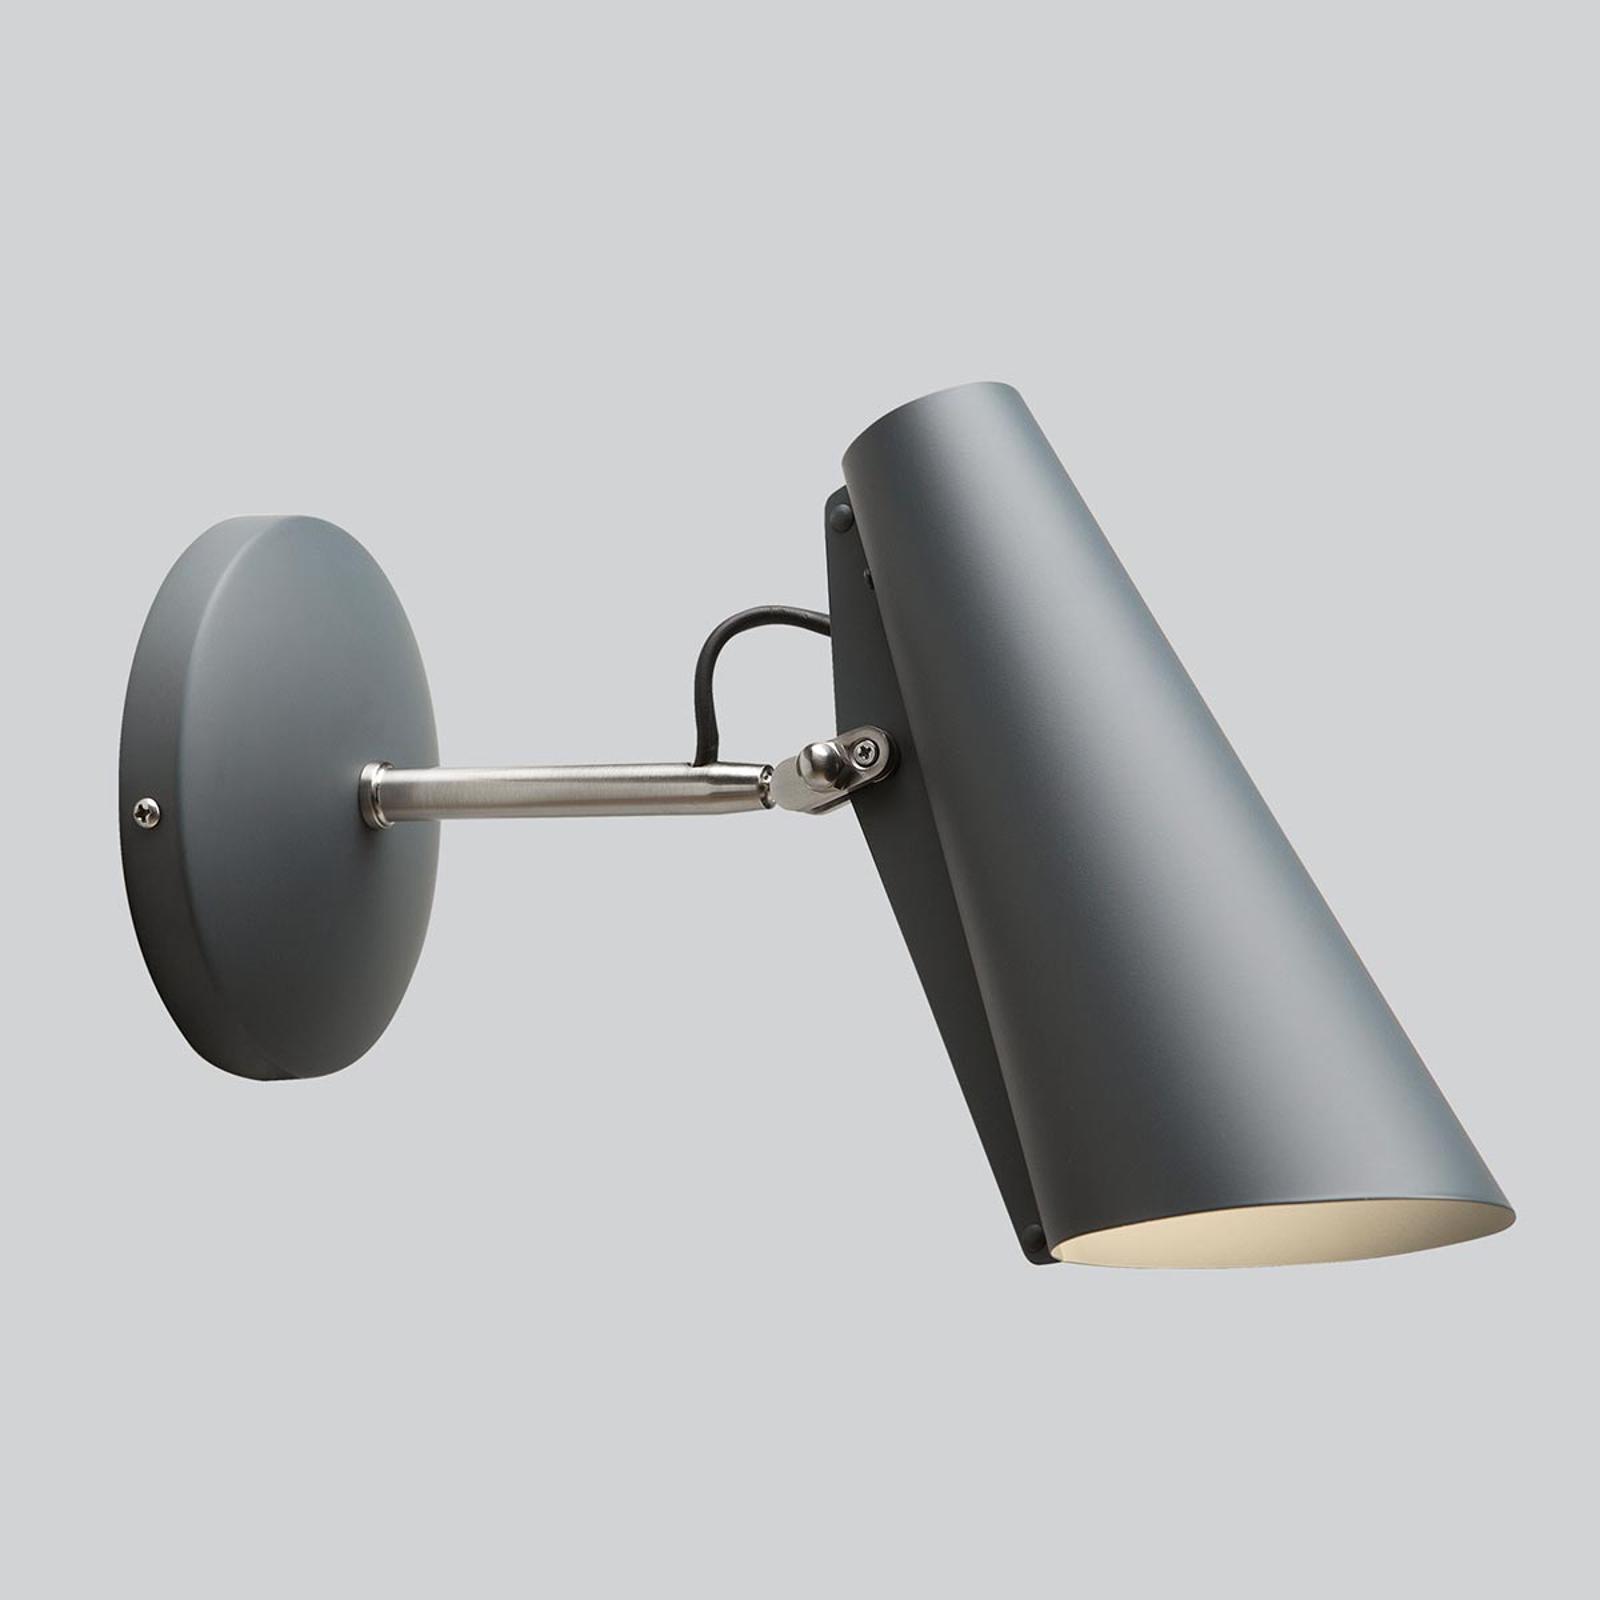 Northern Birdy - wandlamp met stekker, 31,5 cm